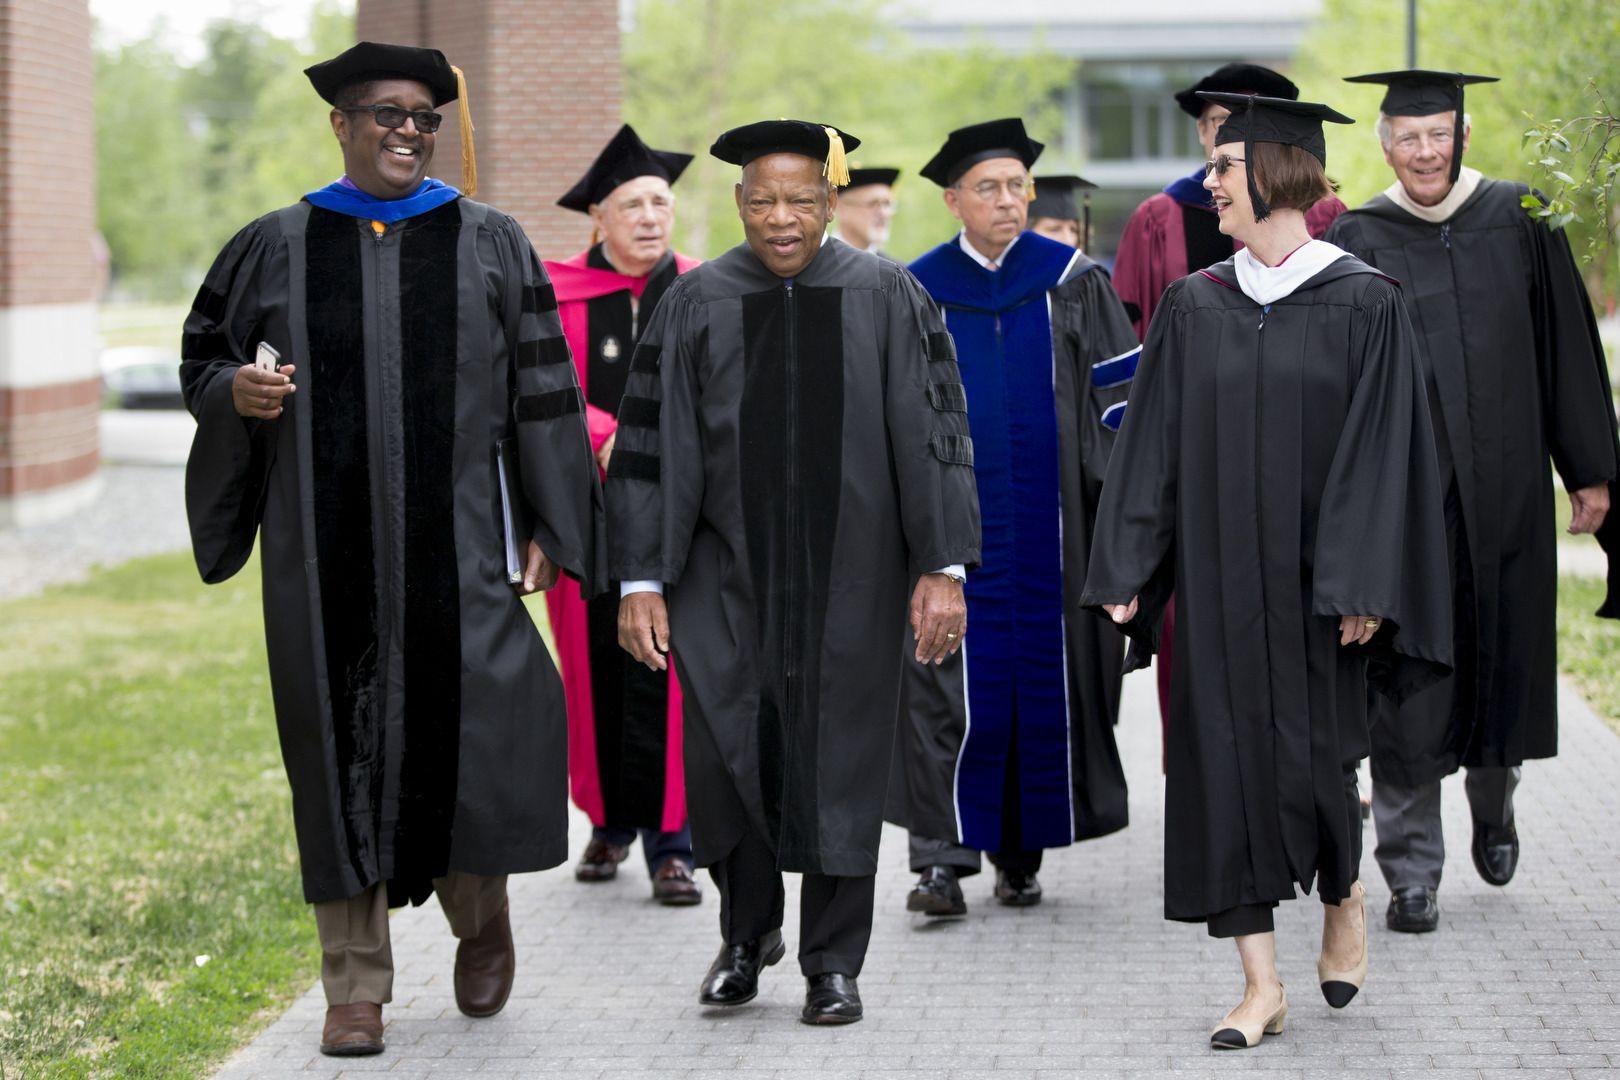 Commencement speaker John R. Lewis, the civil rights icon and congressman from Georgia, processes down Alumni Walk with Professor of Rhetoric Charles Nero and Bates Trustee Geraldine FitzGerald '75. (Phyllis Graber Jensen/Bates College)